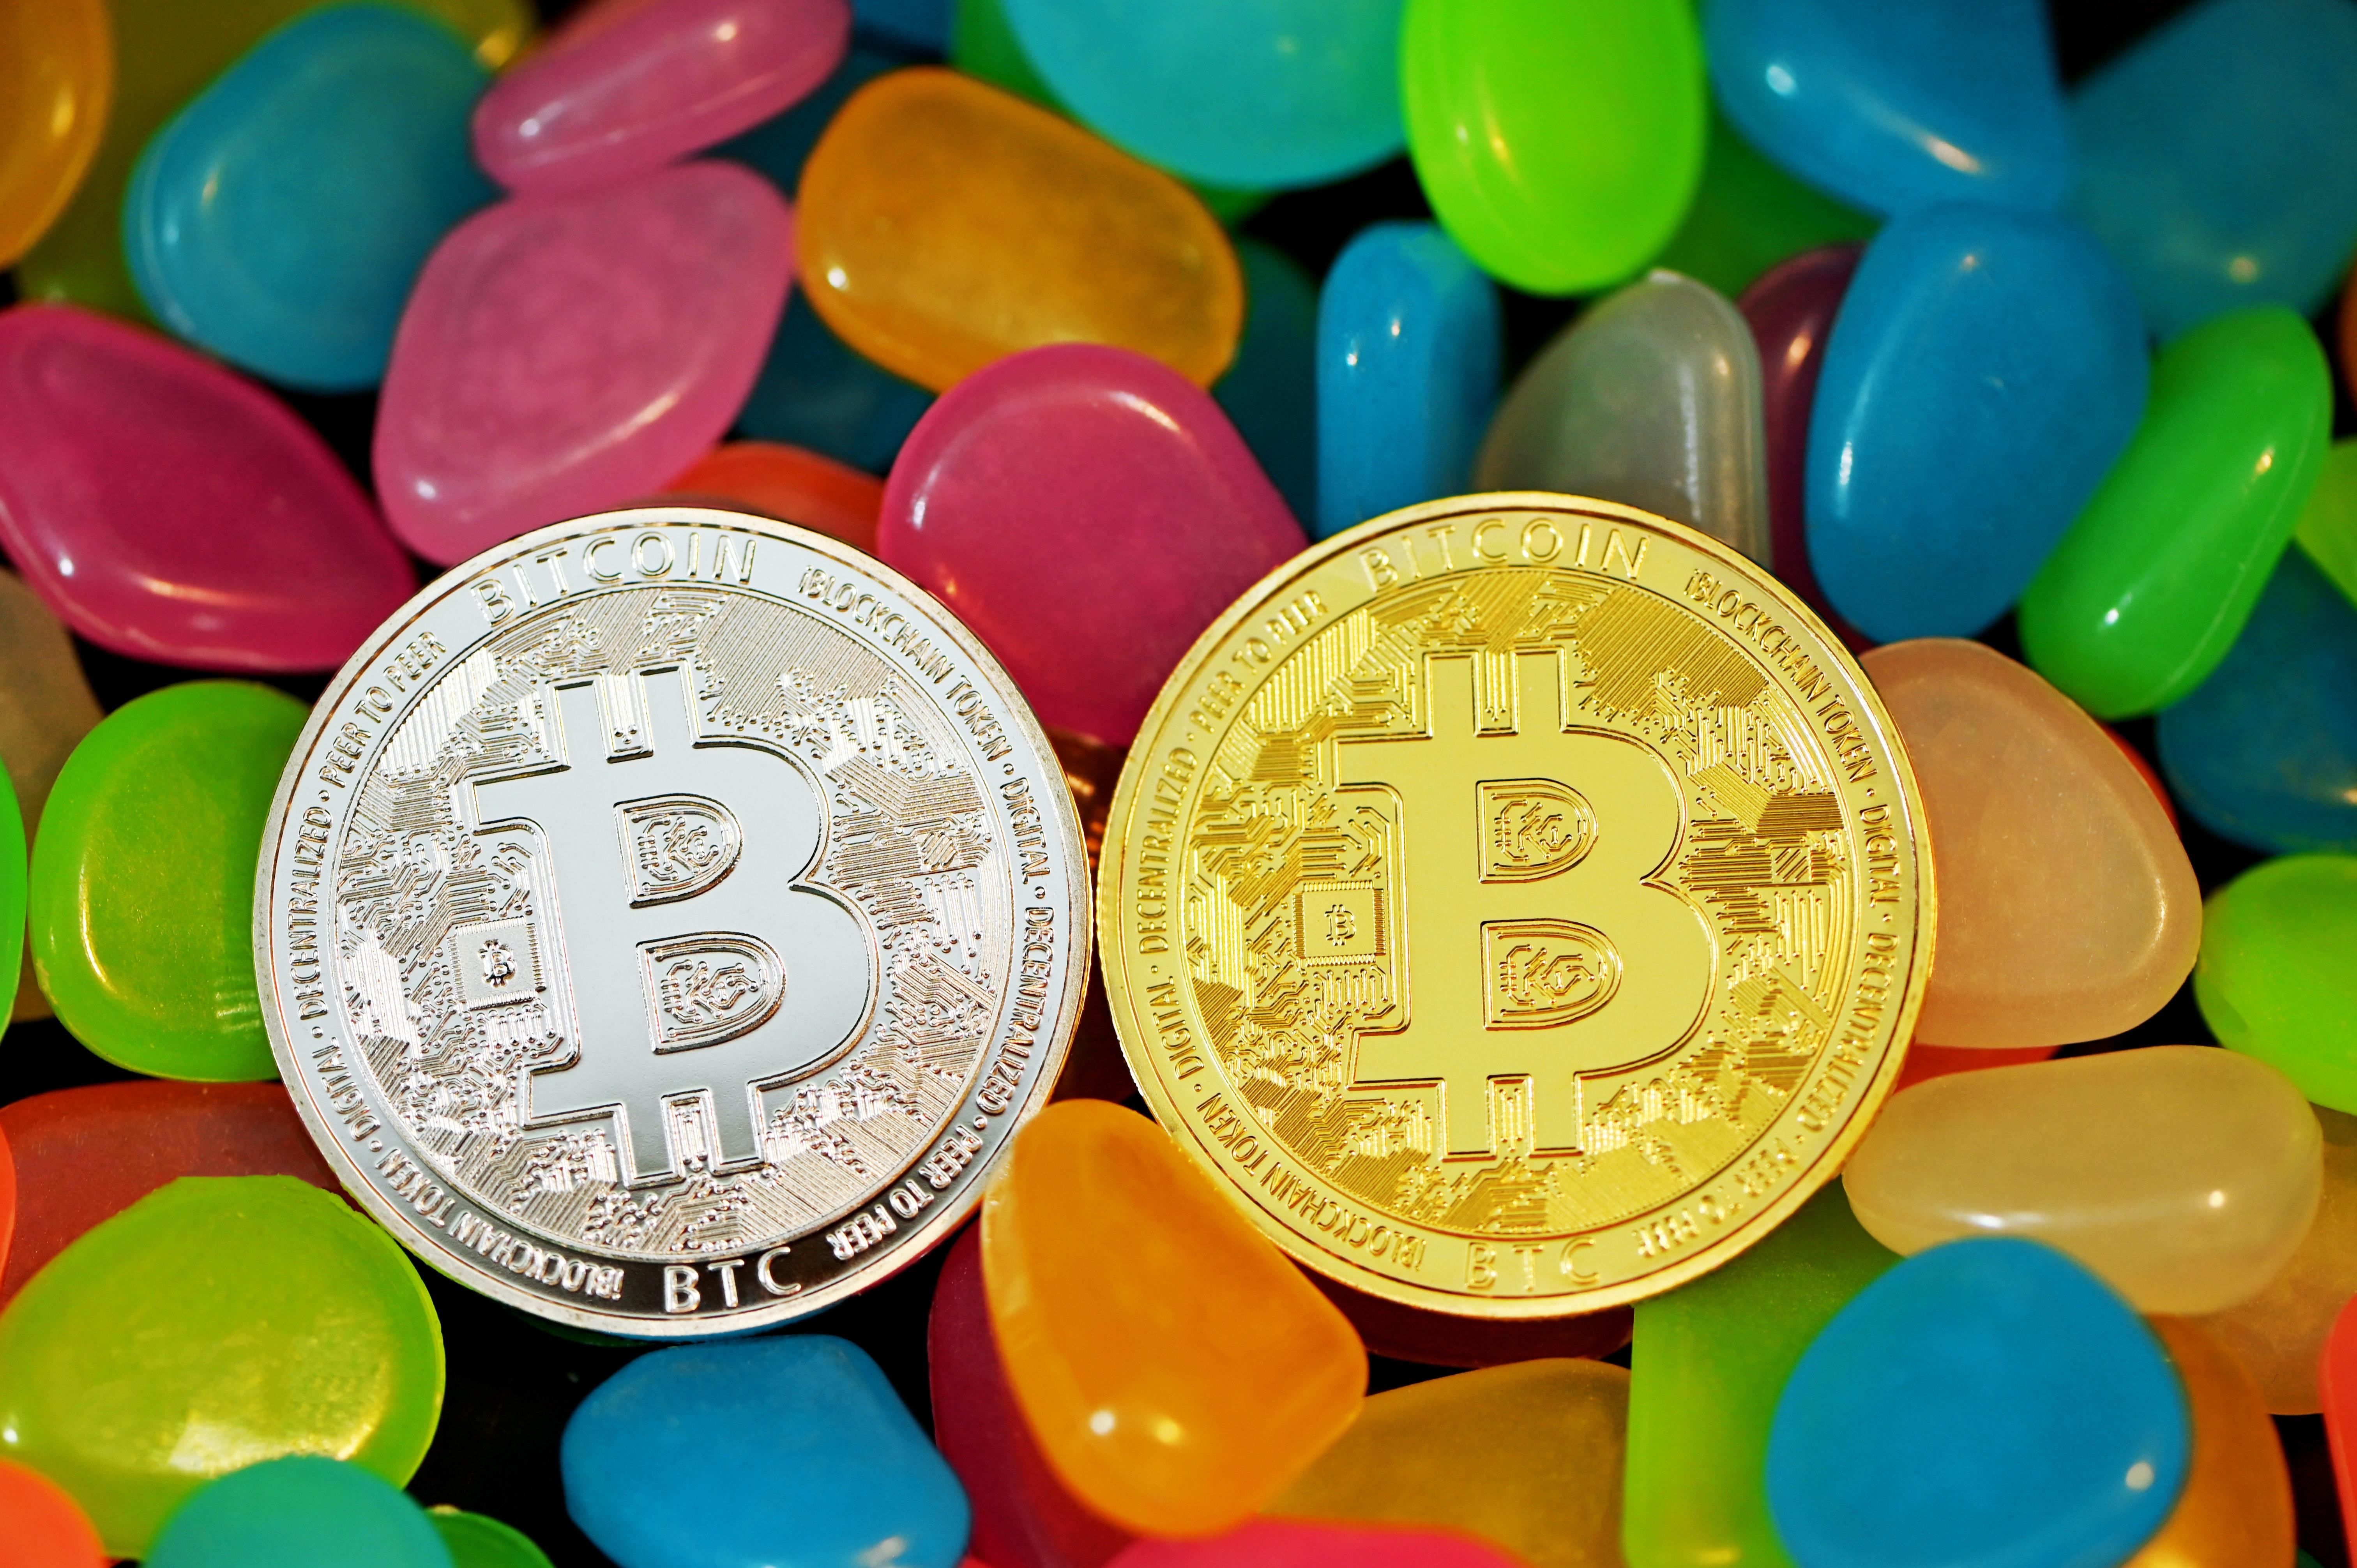 Bitcoin S2F Creator PlanB Thinks BTC Will Reach $135k By December